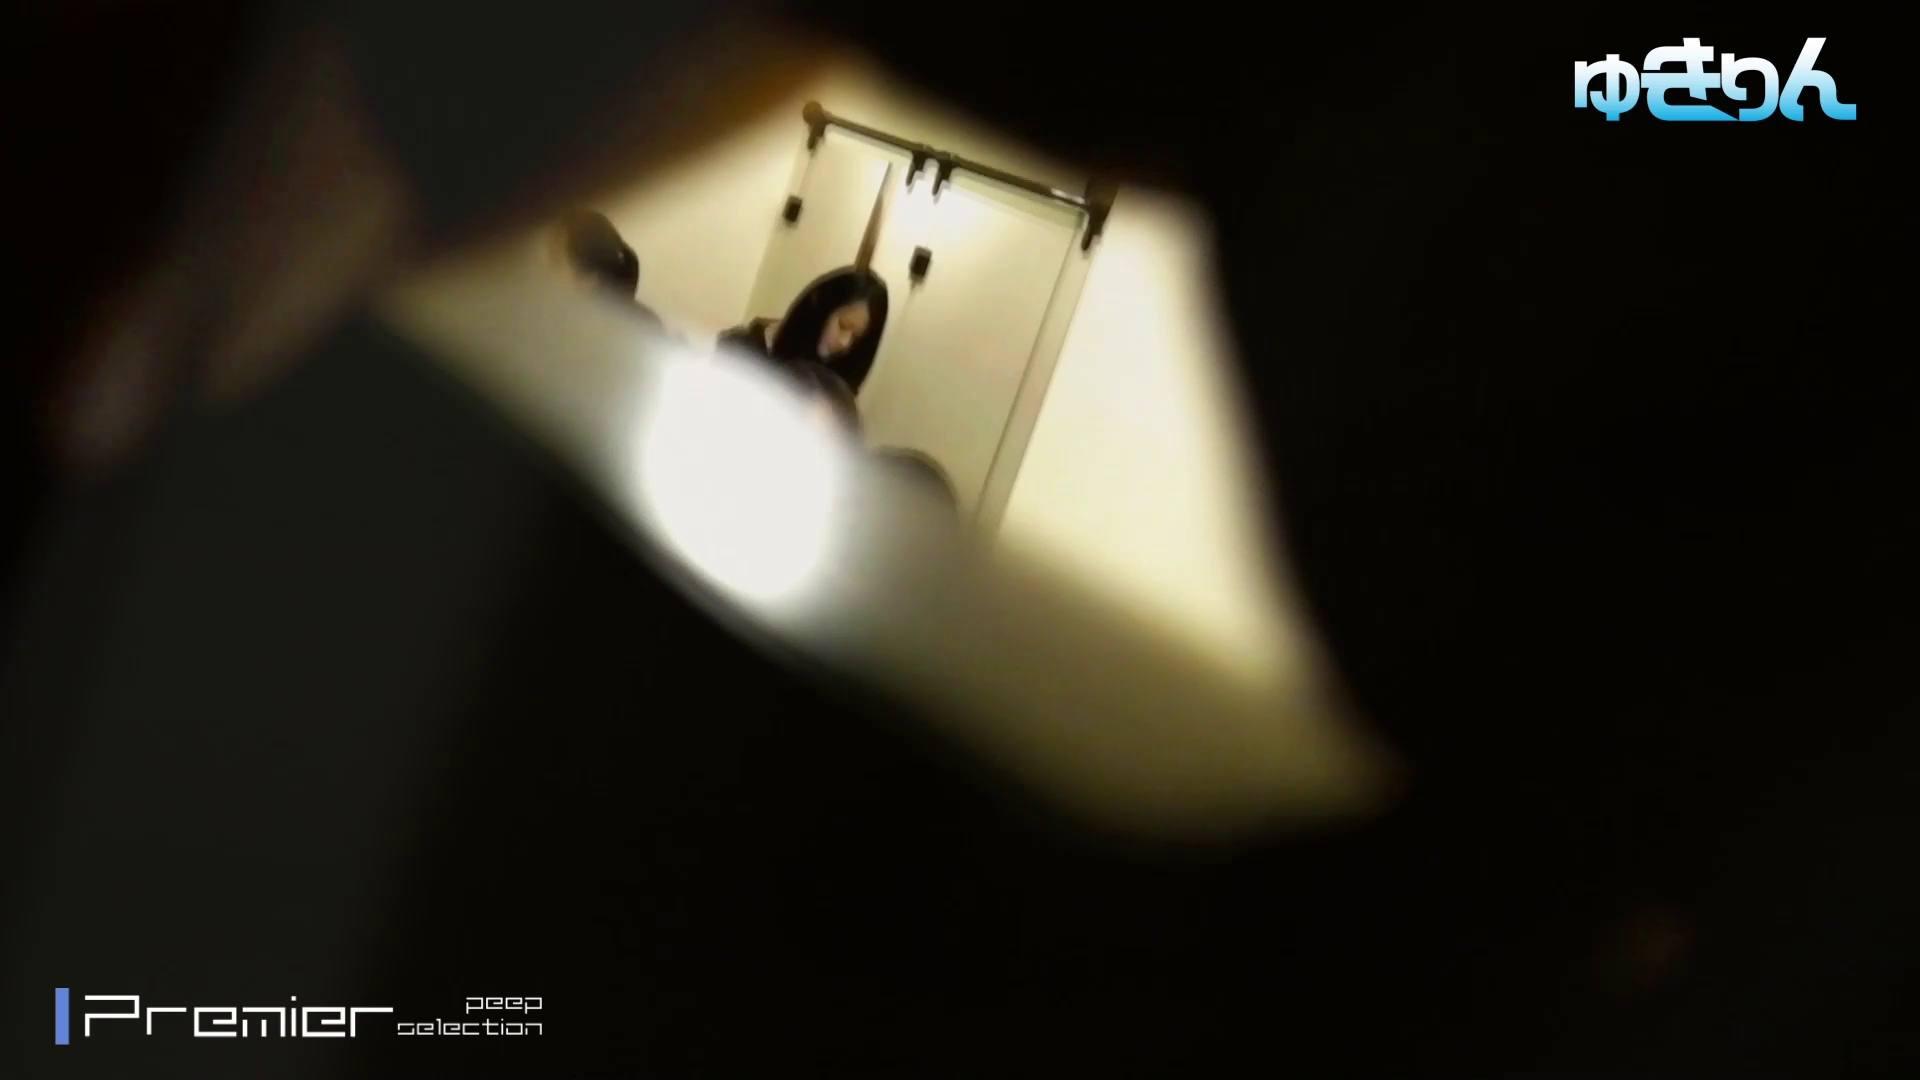 新世界の射窓 No95 細身体型 AV無料 112枚 21